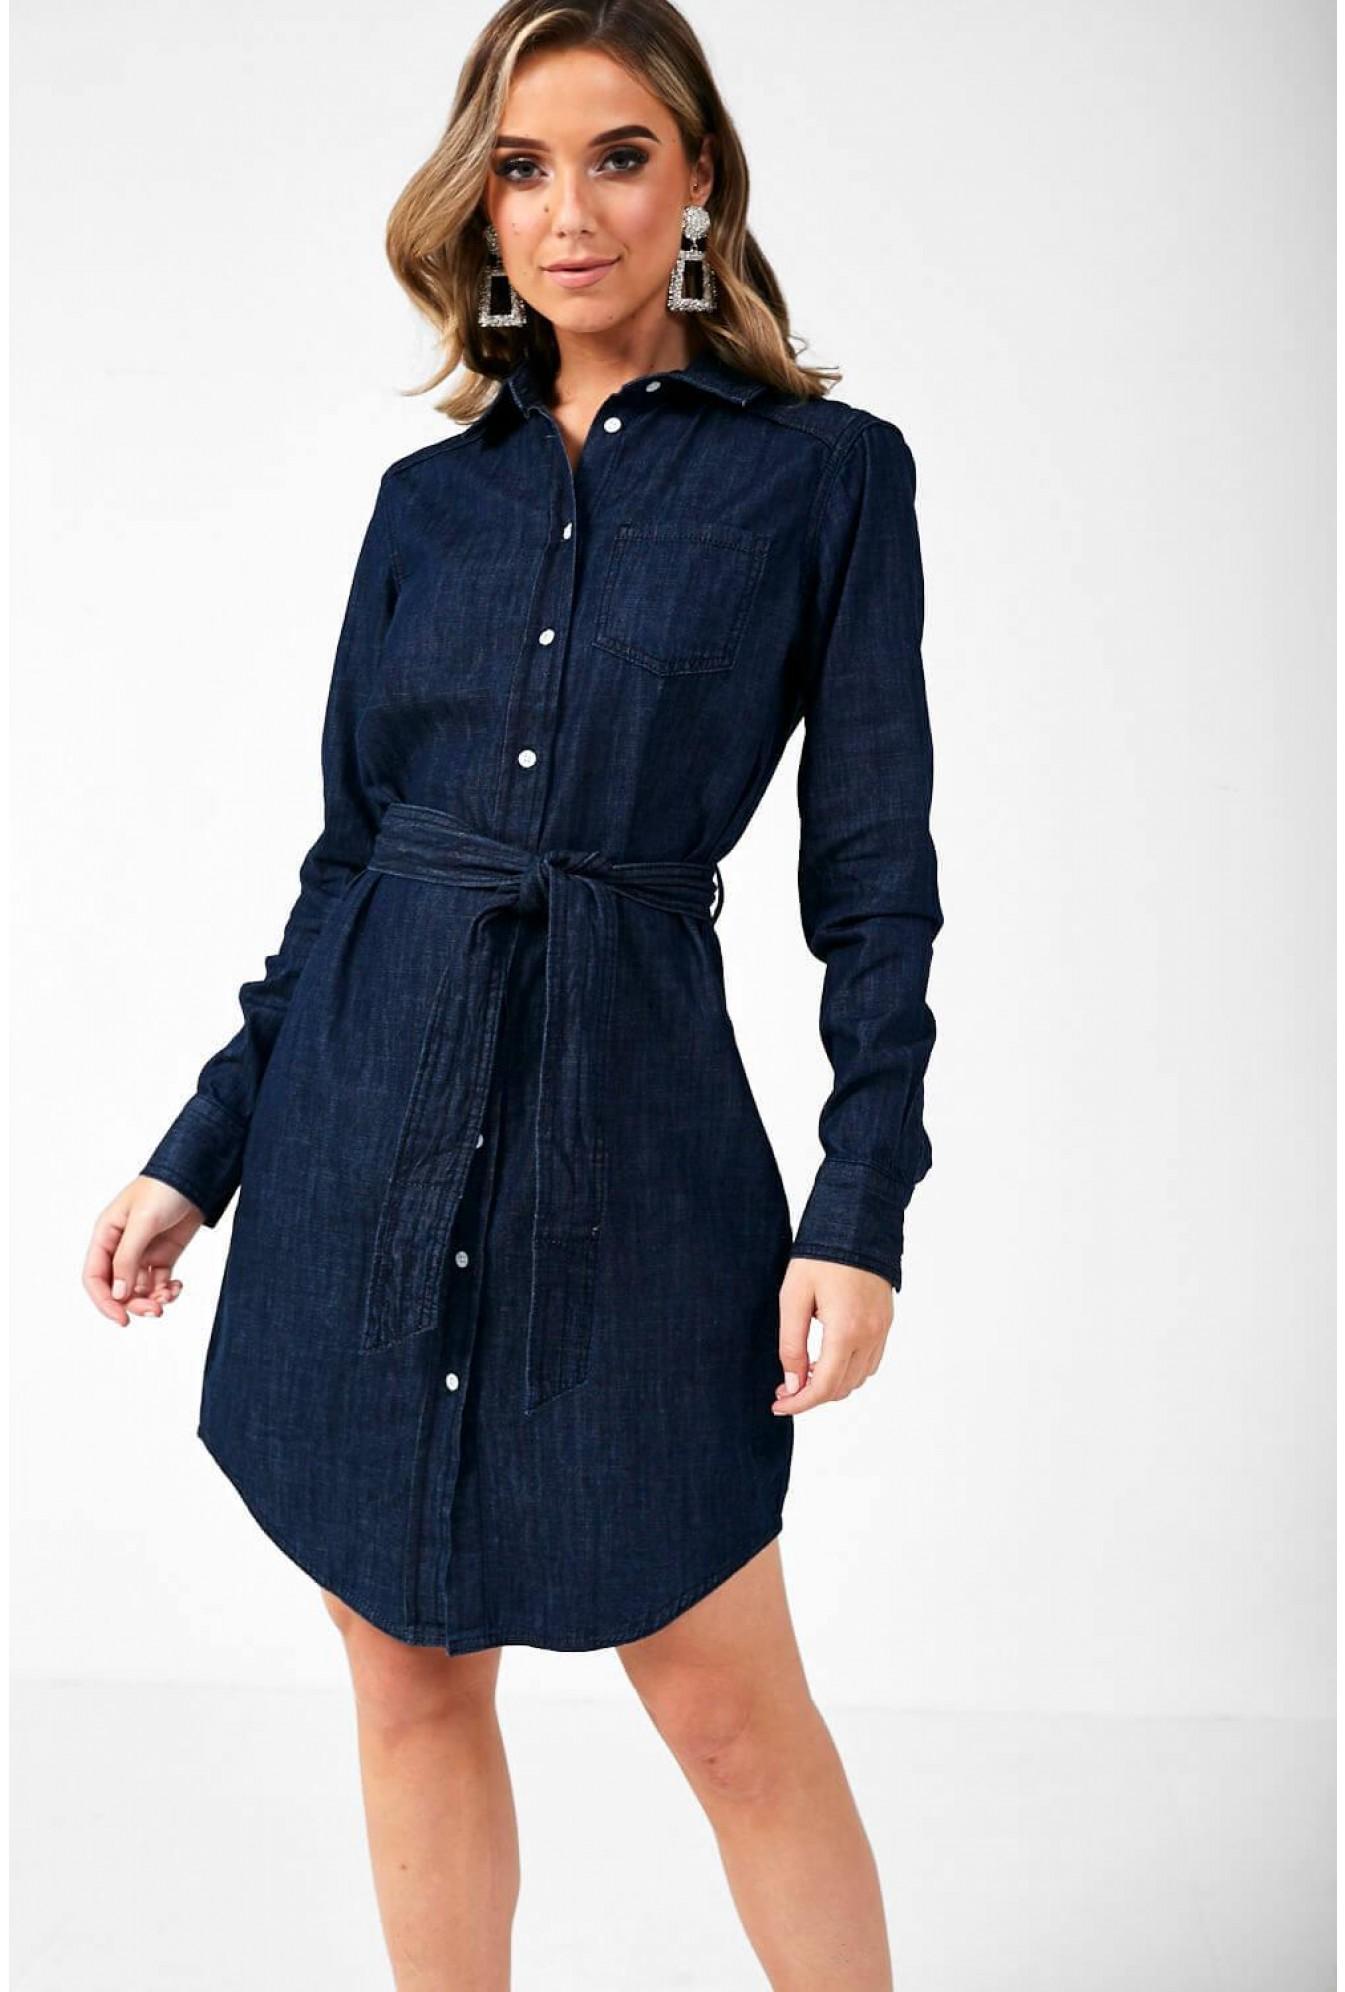 JDY Esra Shirt Dress in Dark Blue Denim